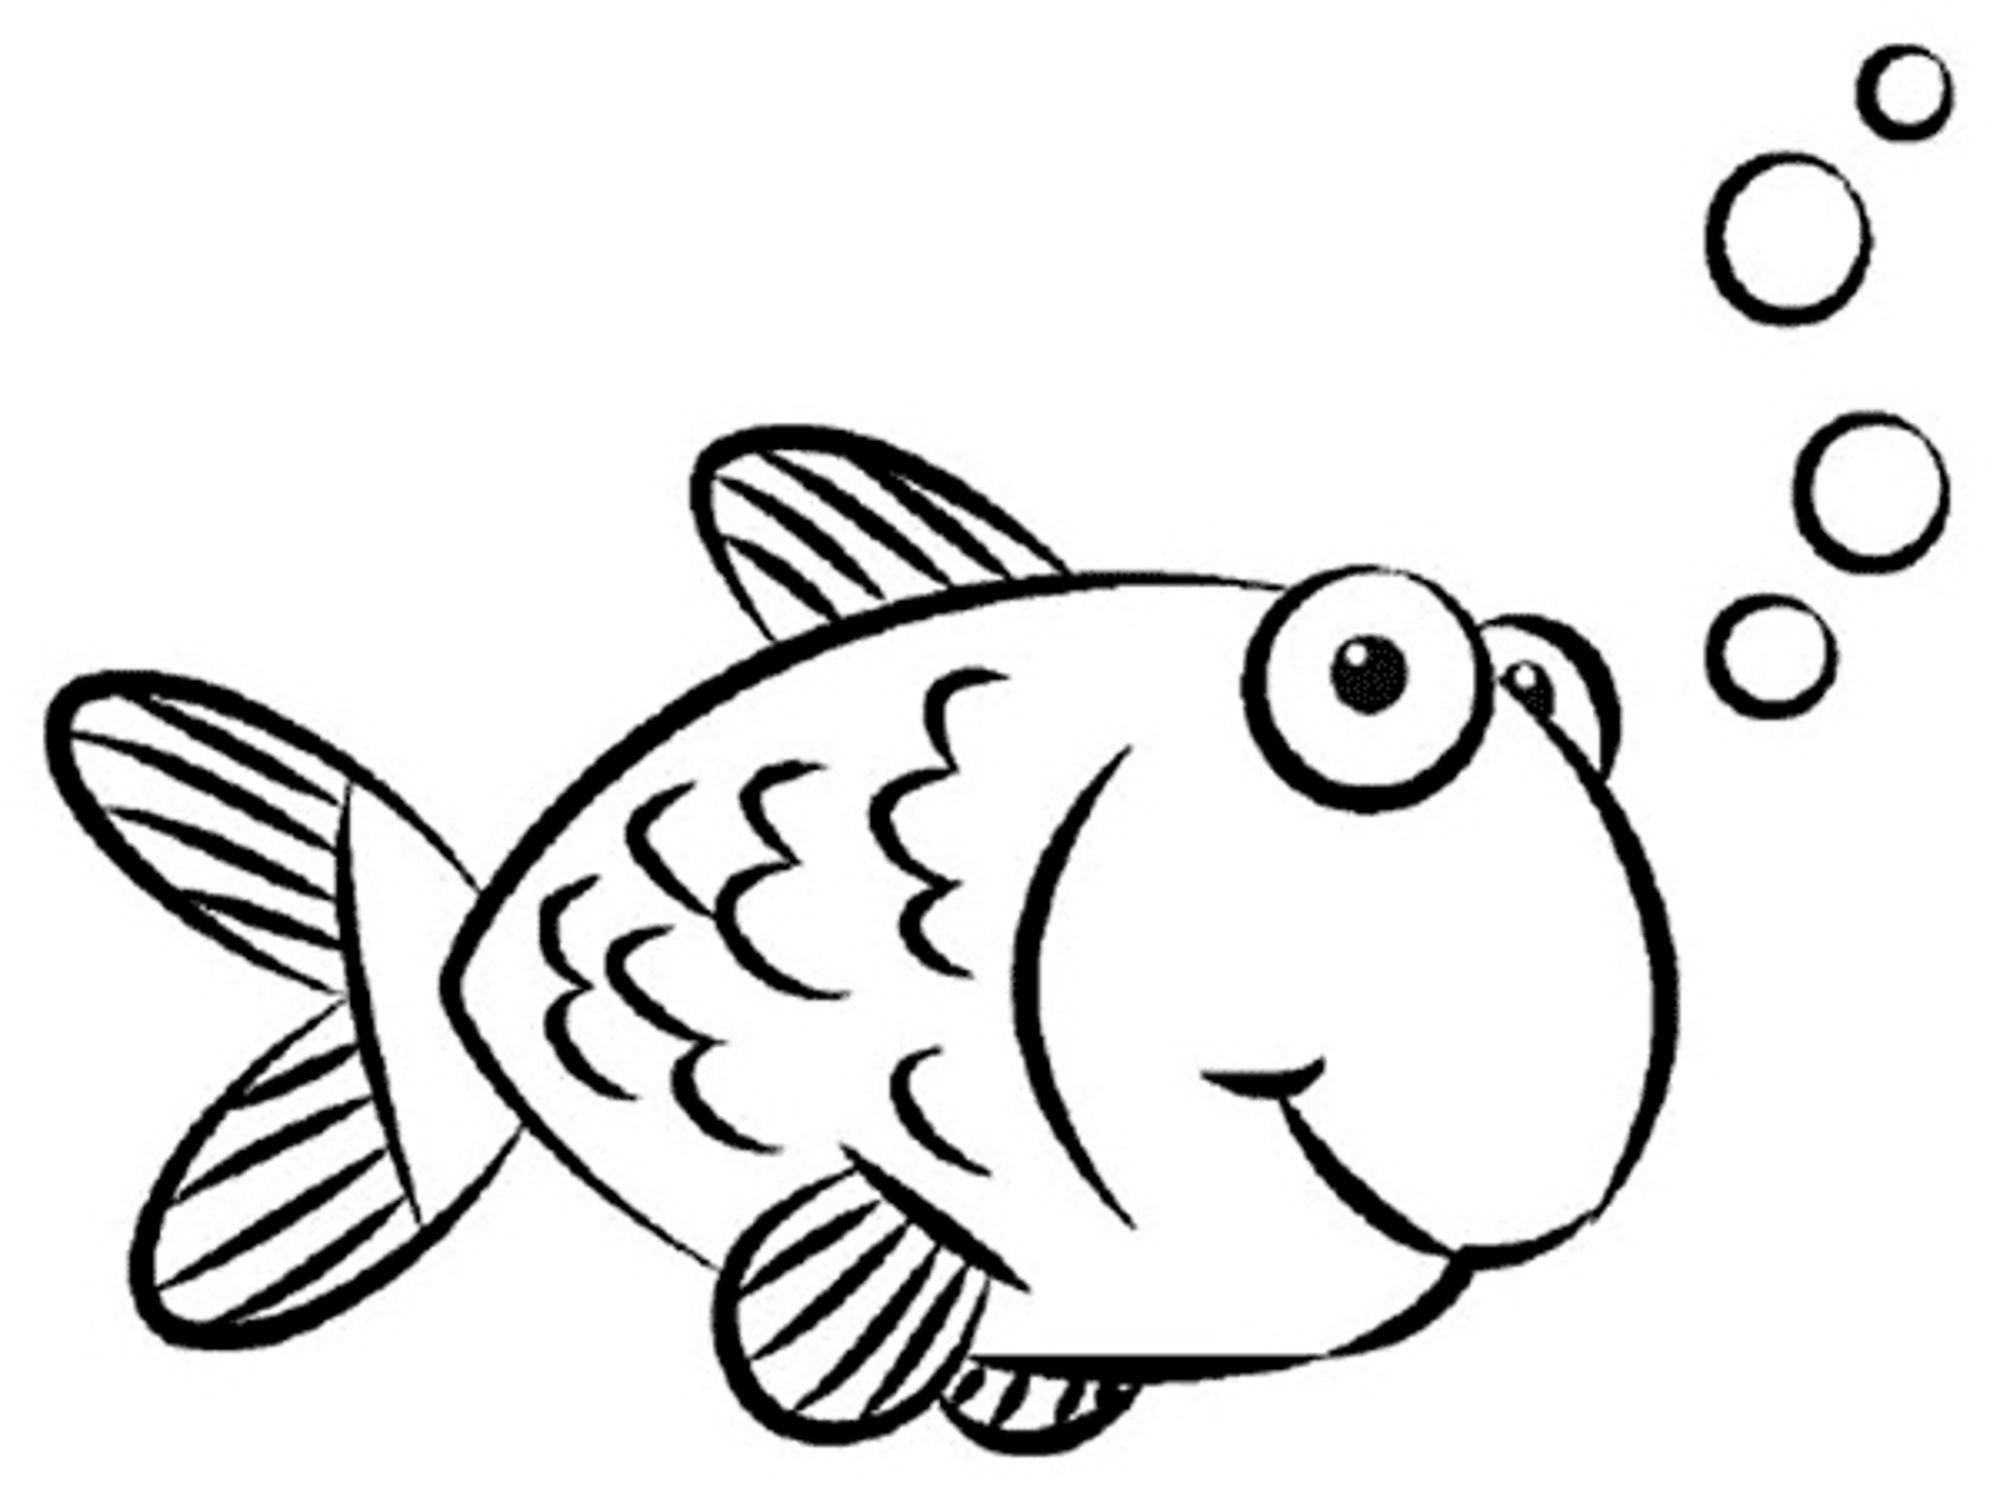 2000x1510 Fish Drawing